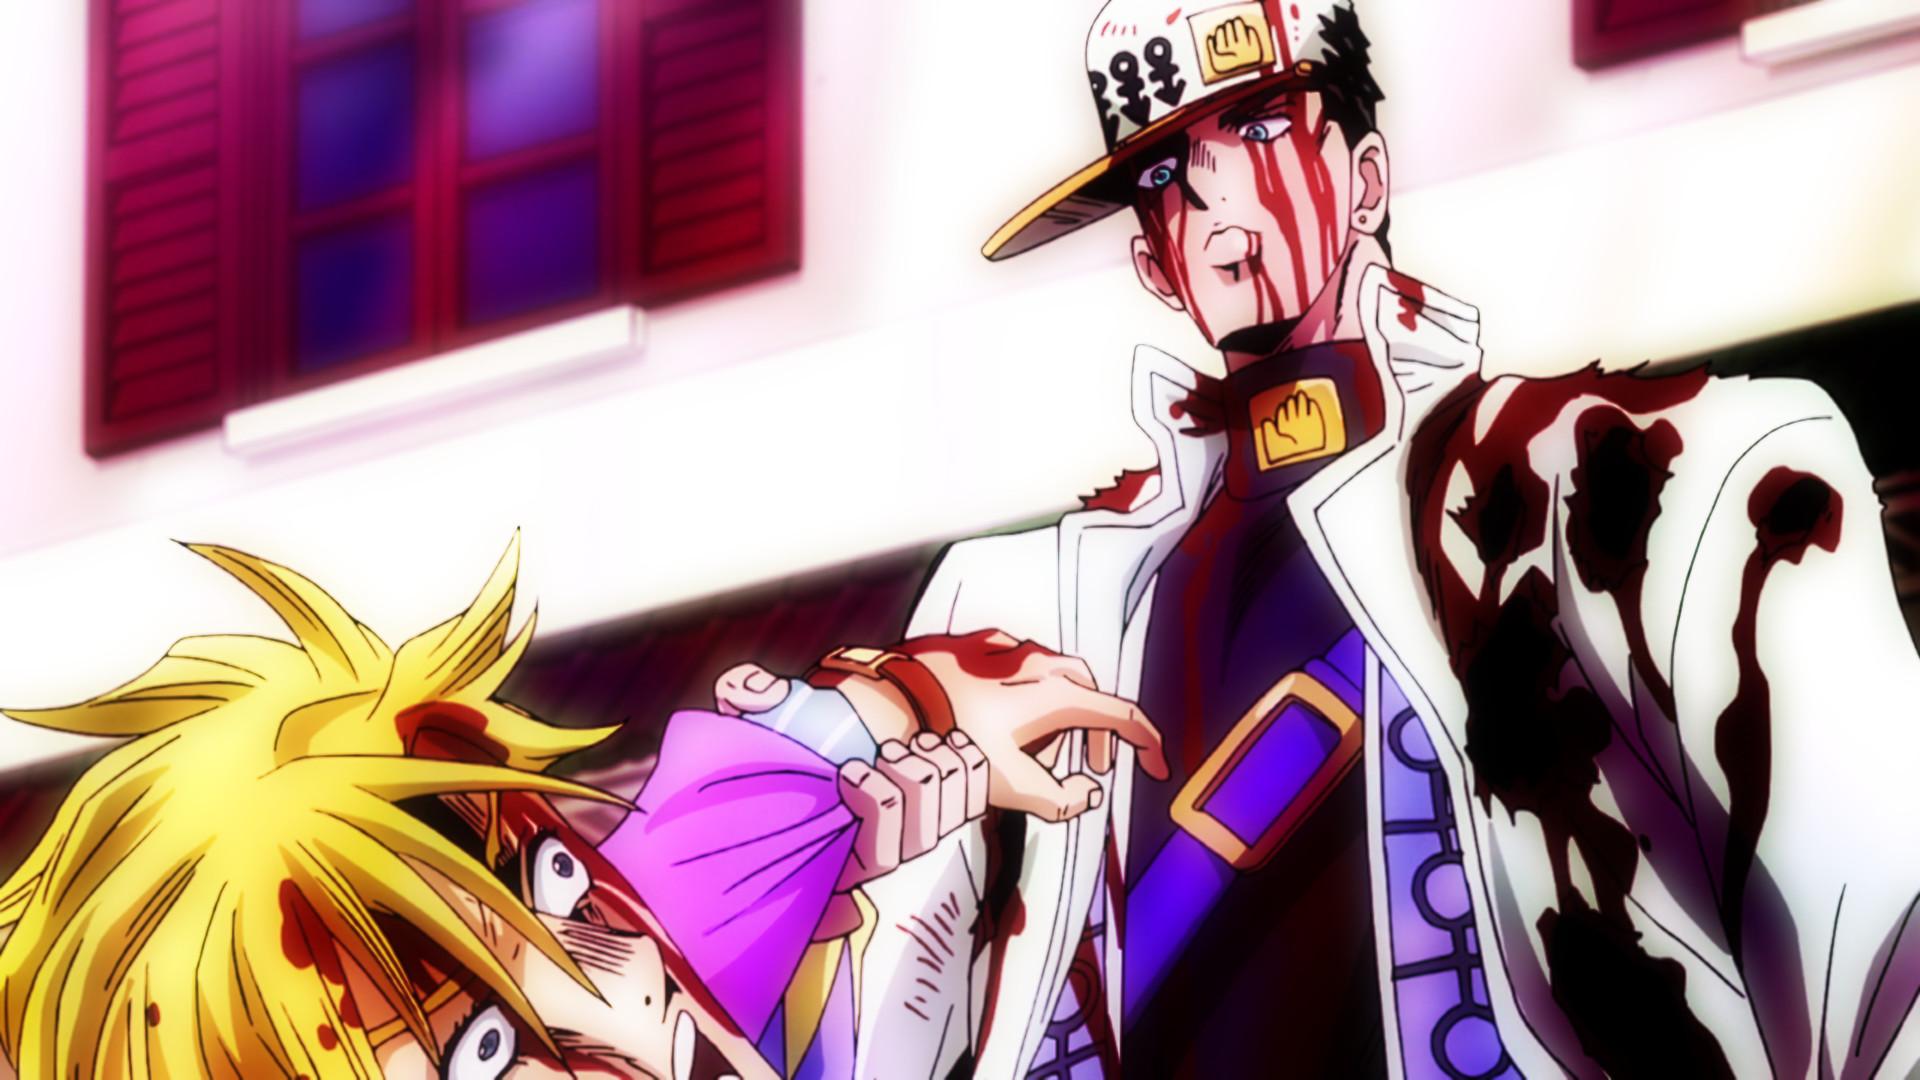 Anime – Jojo's Bizarre Adventure Yoshikage Kira Jotaro Kujo Bakgrund